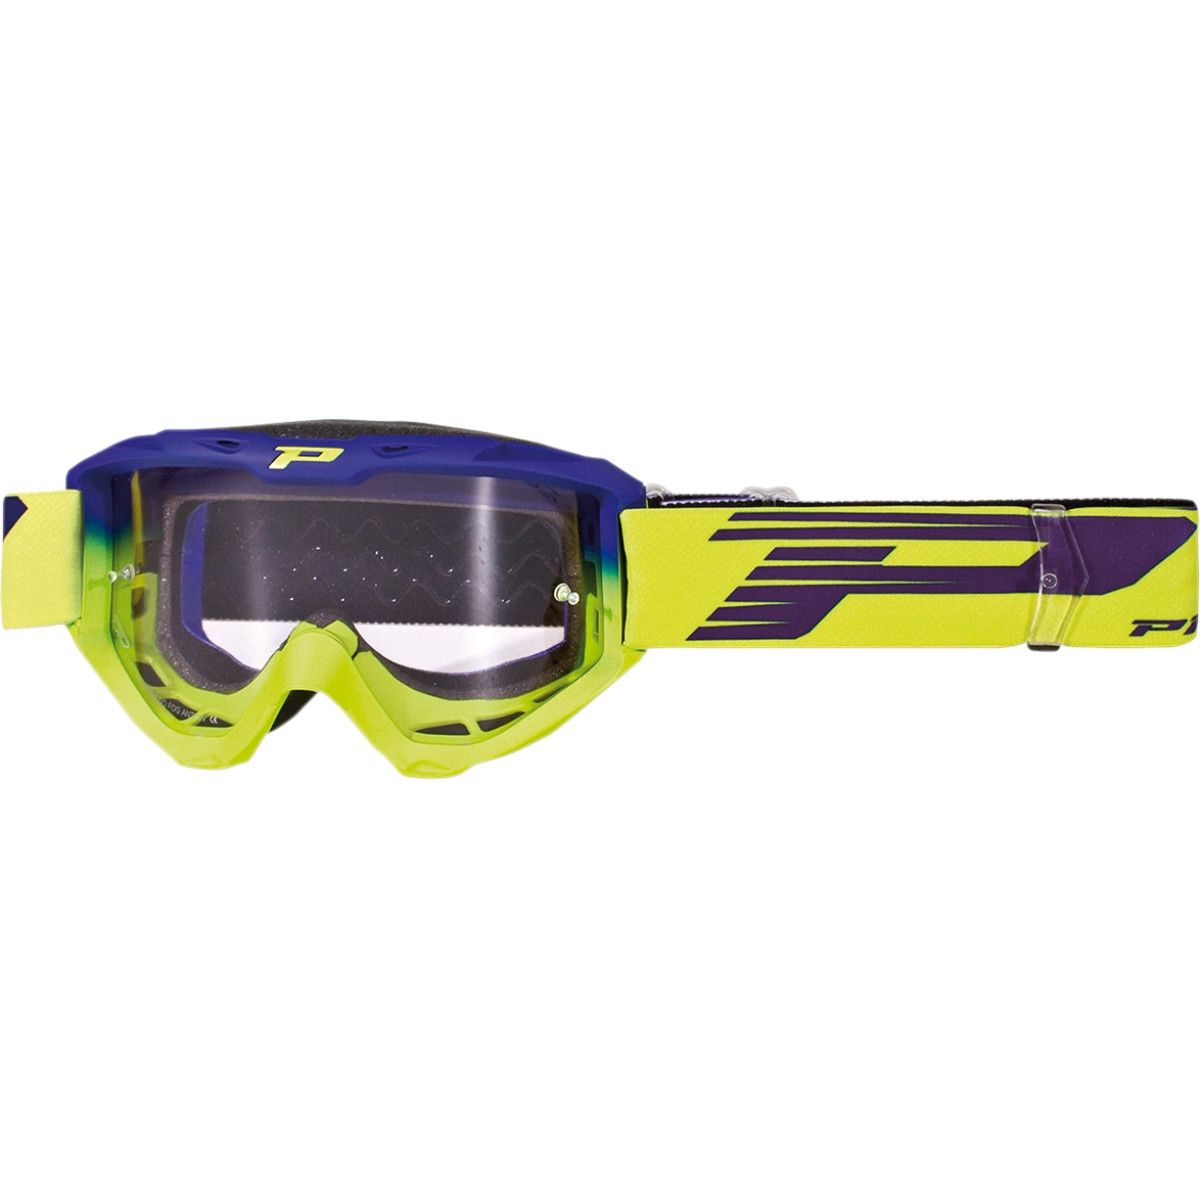 Progrip Crossbril 3450 Light Sensitive Riot Blue/Yellow